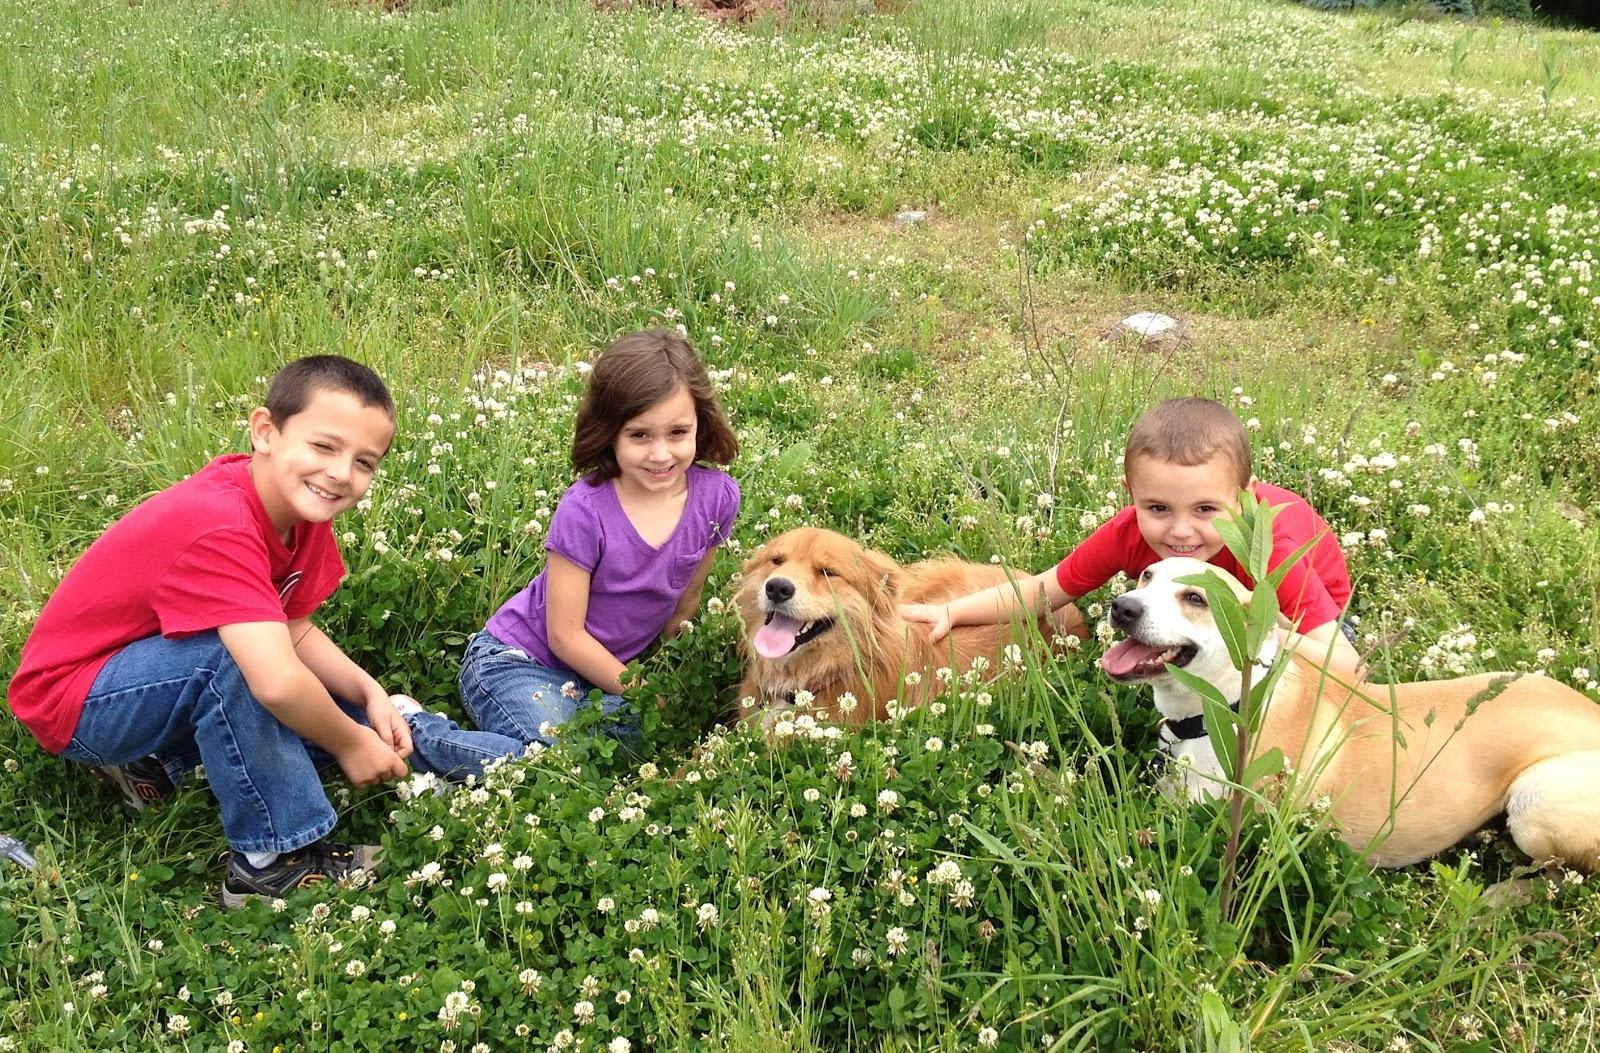 montagna cane bambini prati